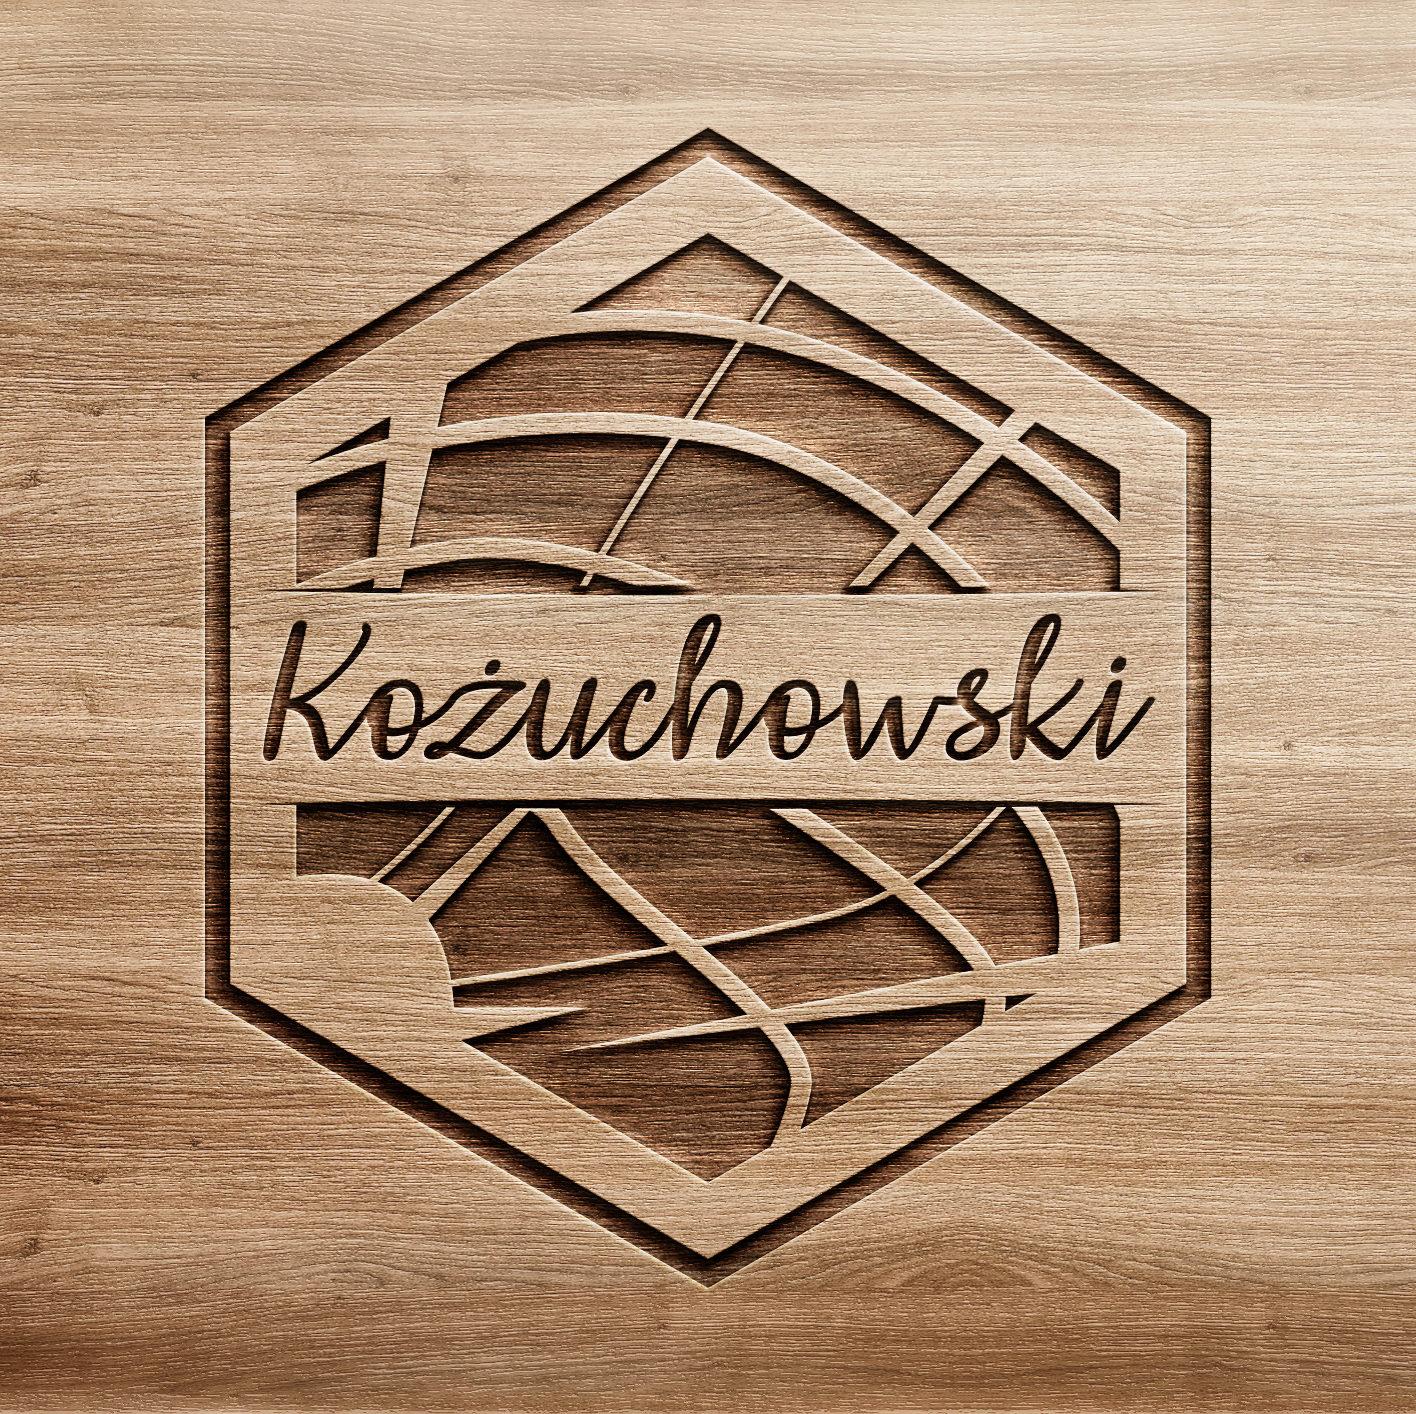 Stolarnia Kożuchowscy